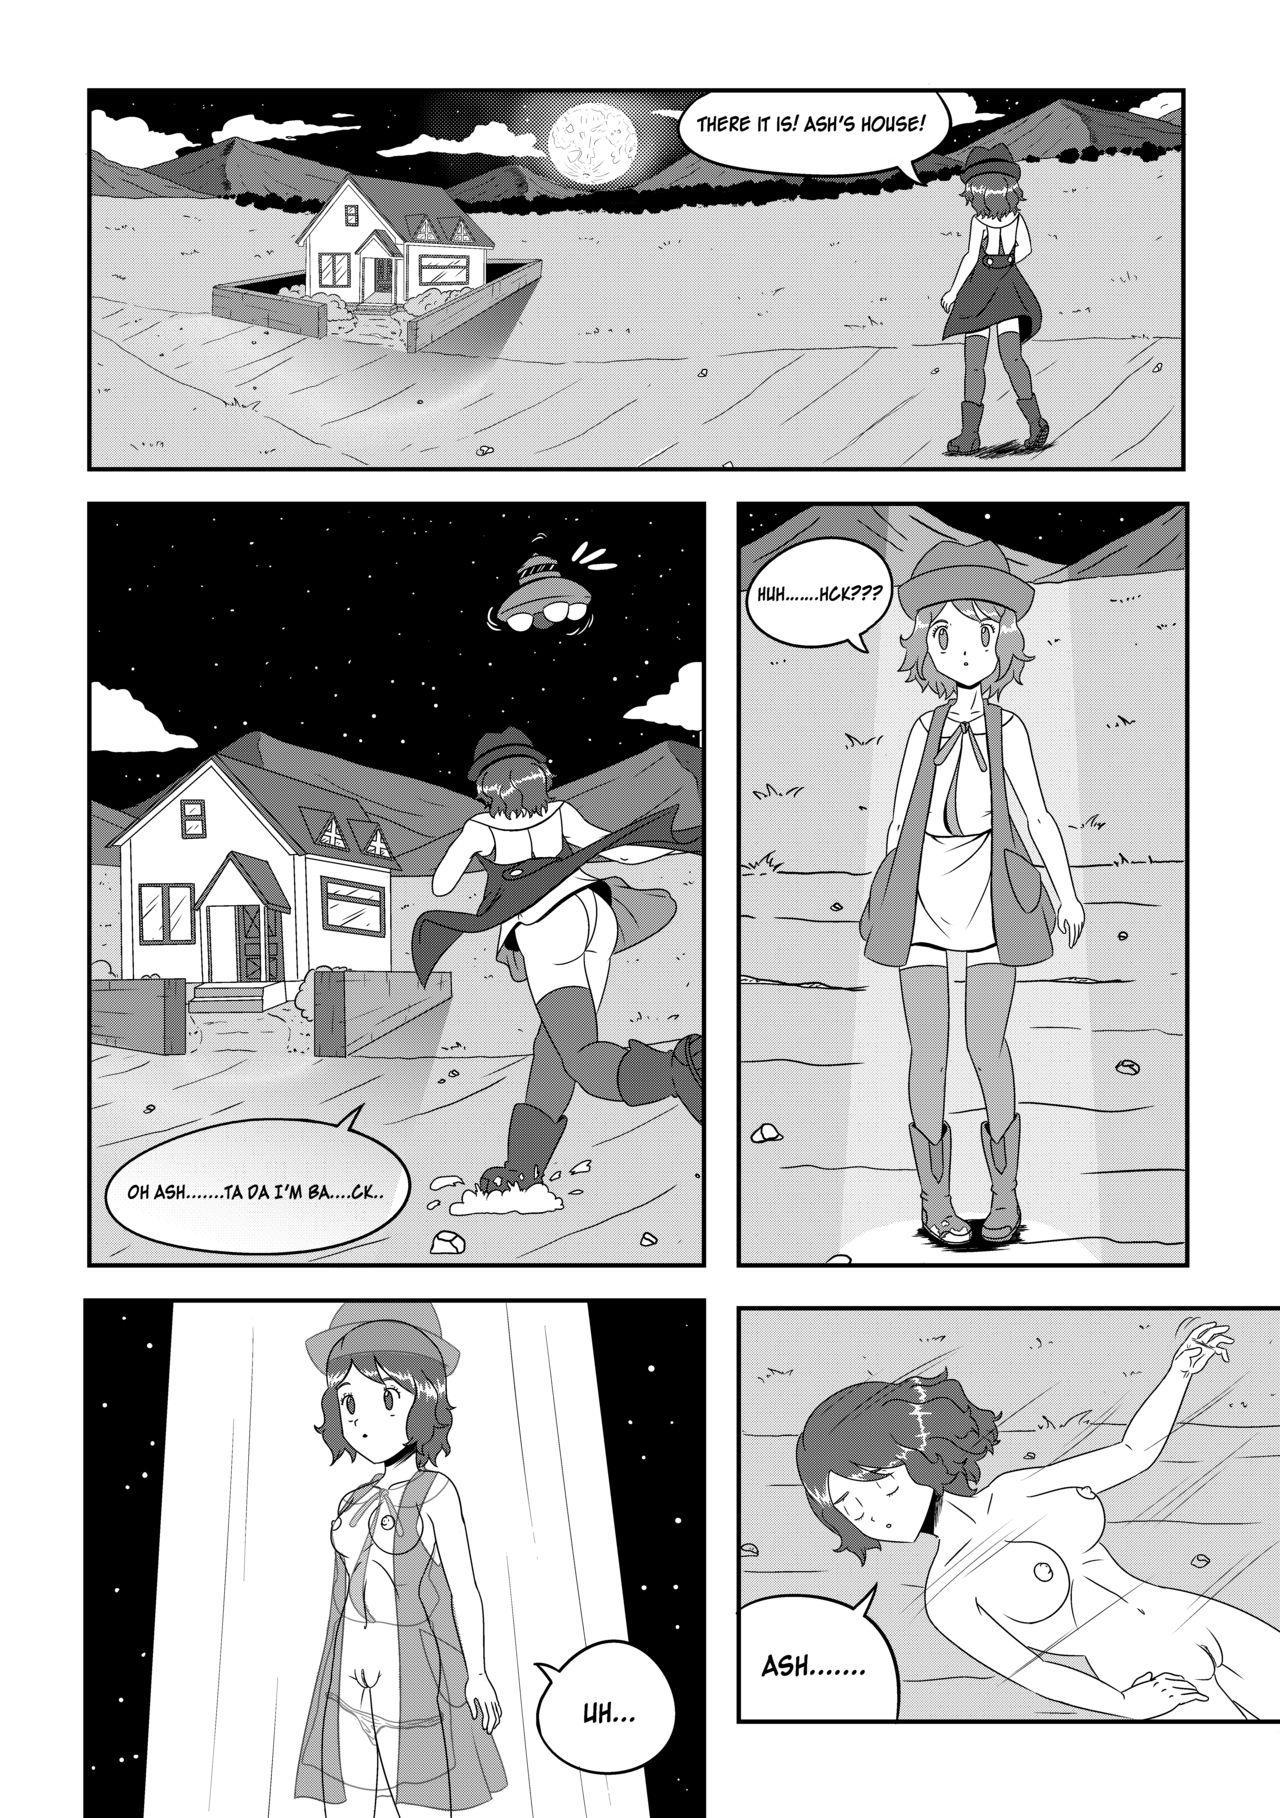 The Probing of a Pokegirl, Serena 1